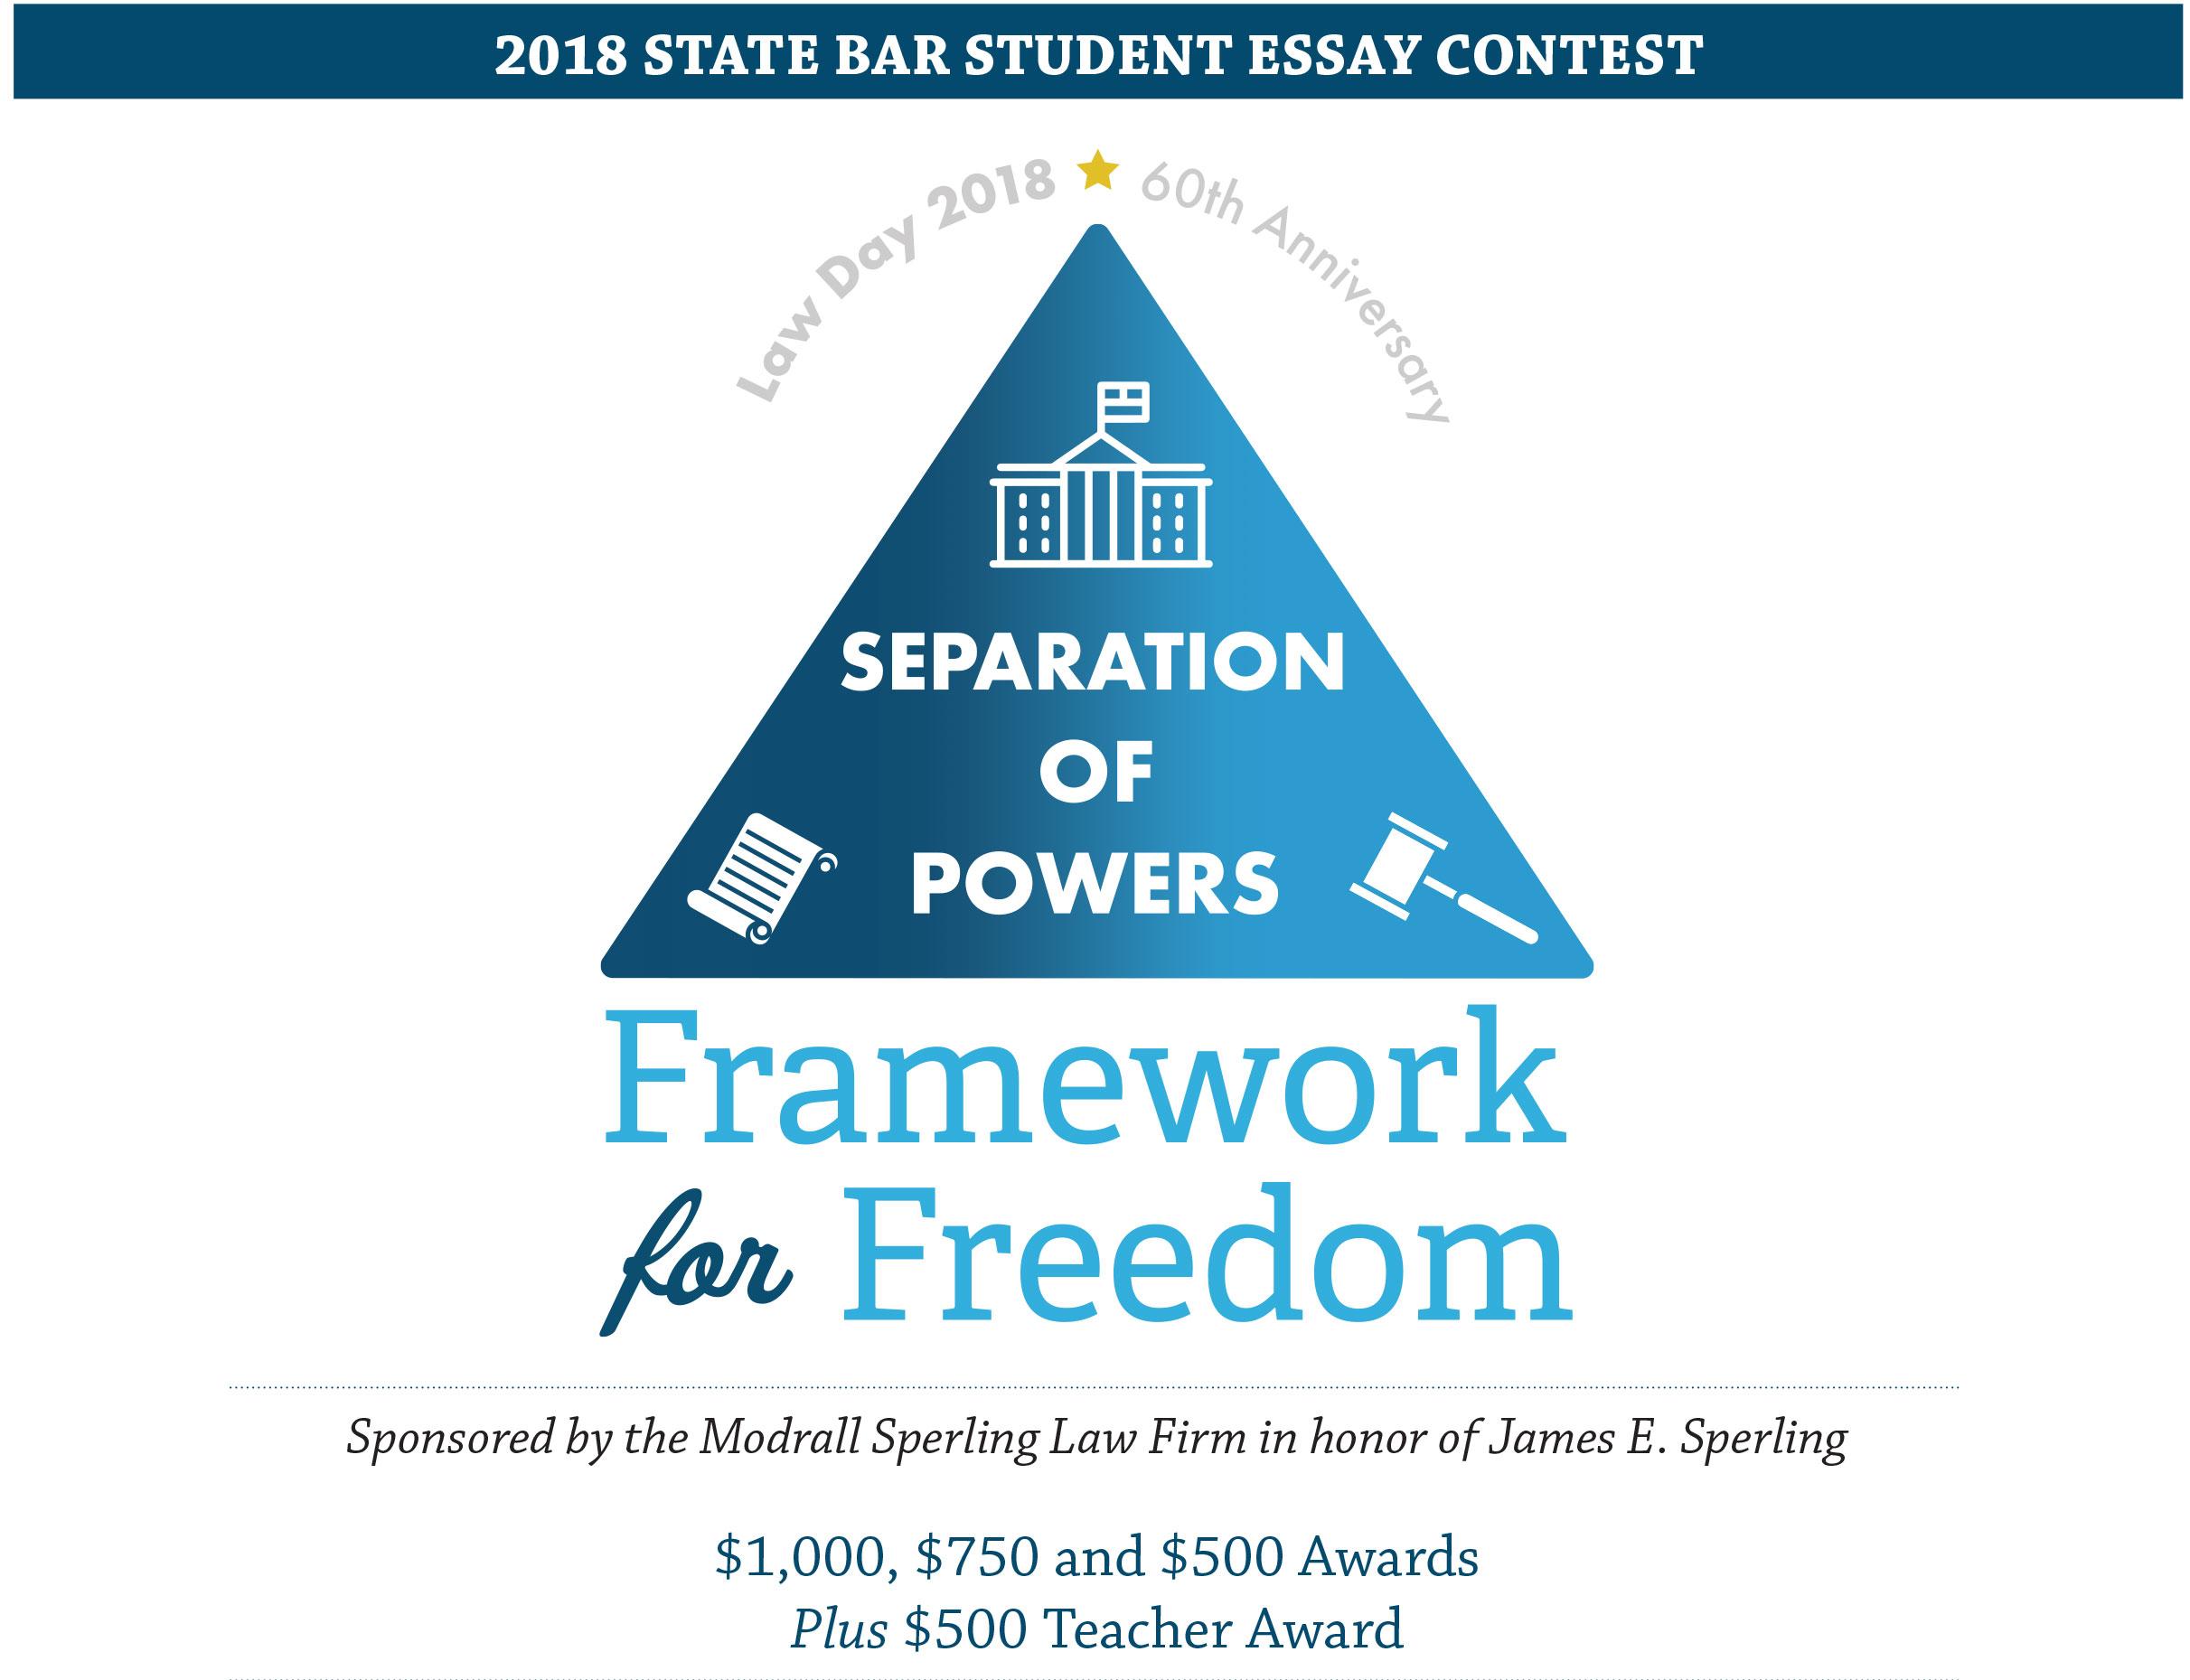 006 Separationofpowers Essay Contest Amazing Writing High School Contests For Seniors 2018 Full